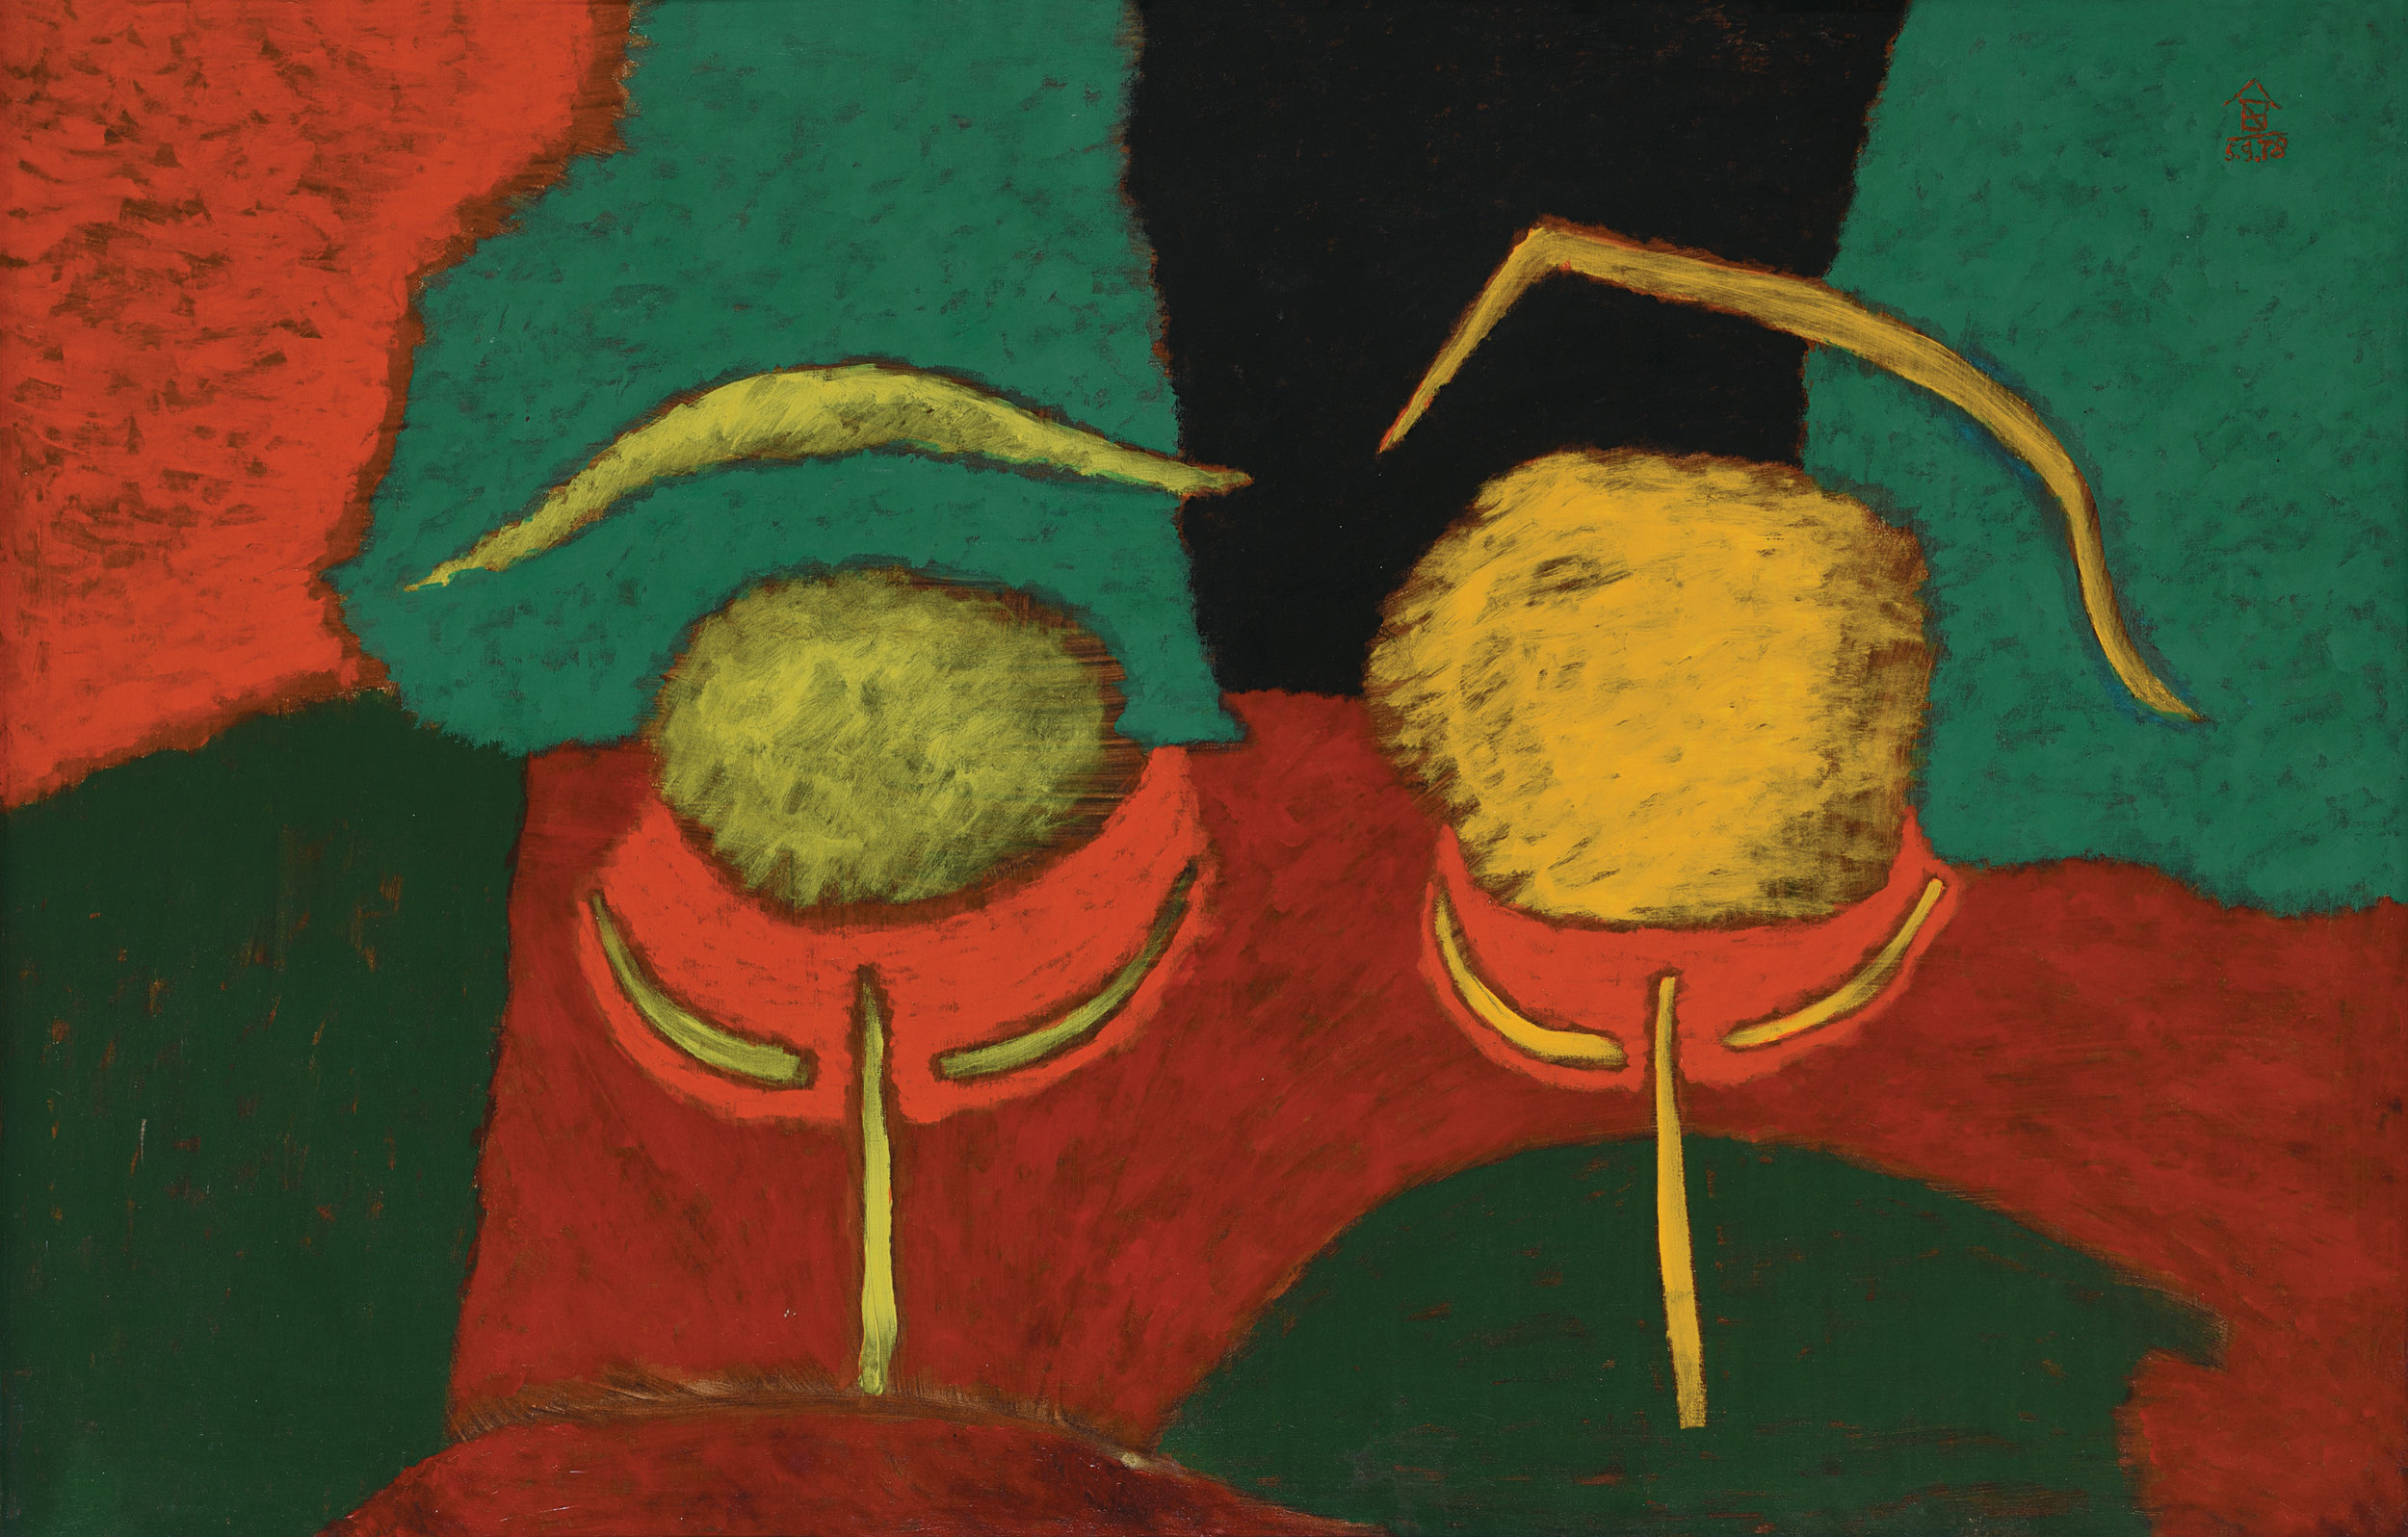 Nashar, Untitled, oil on canvas, 89 x 138 cm, 1978